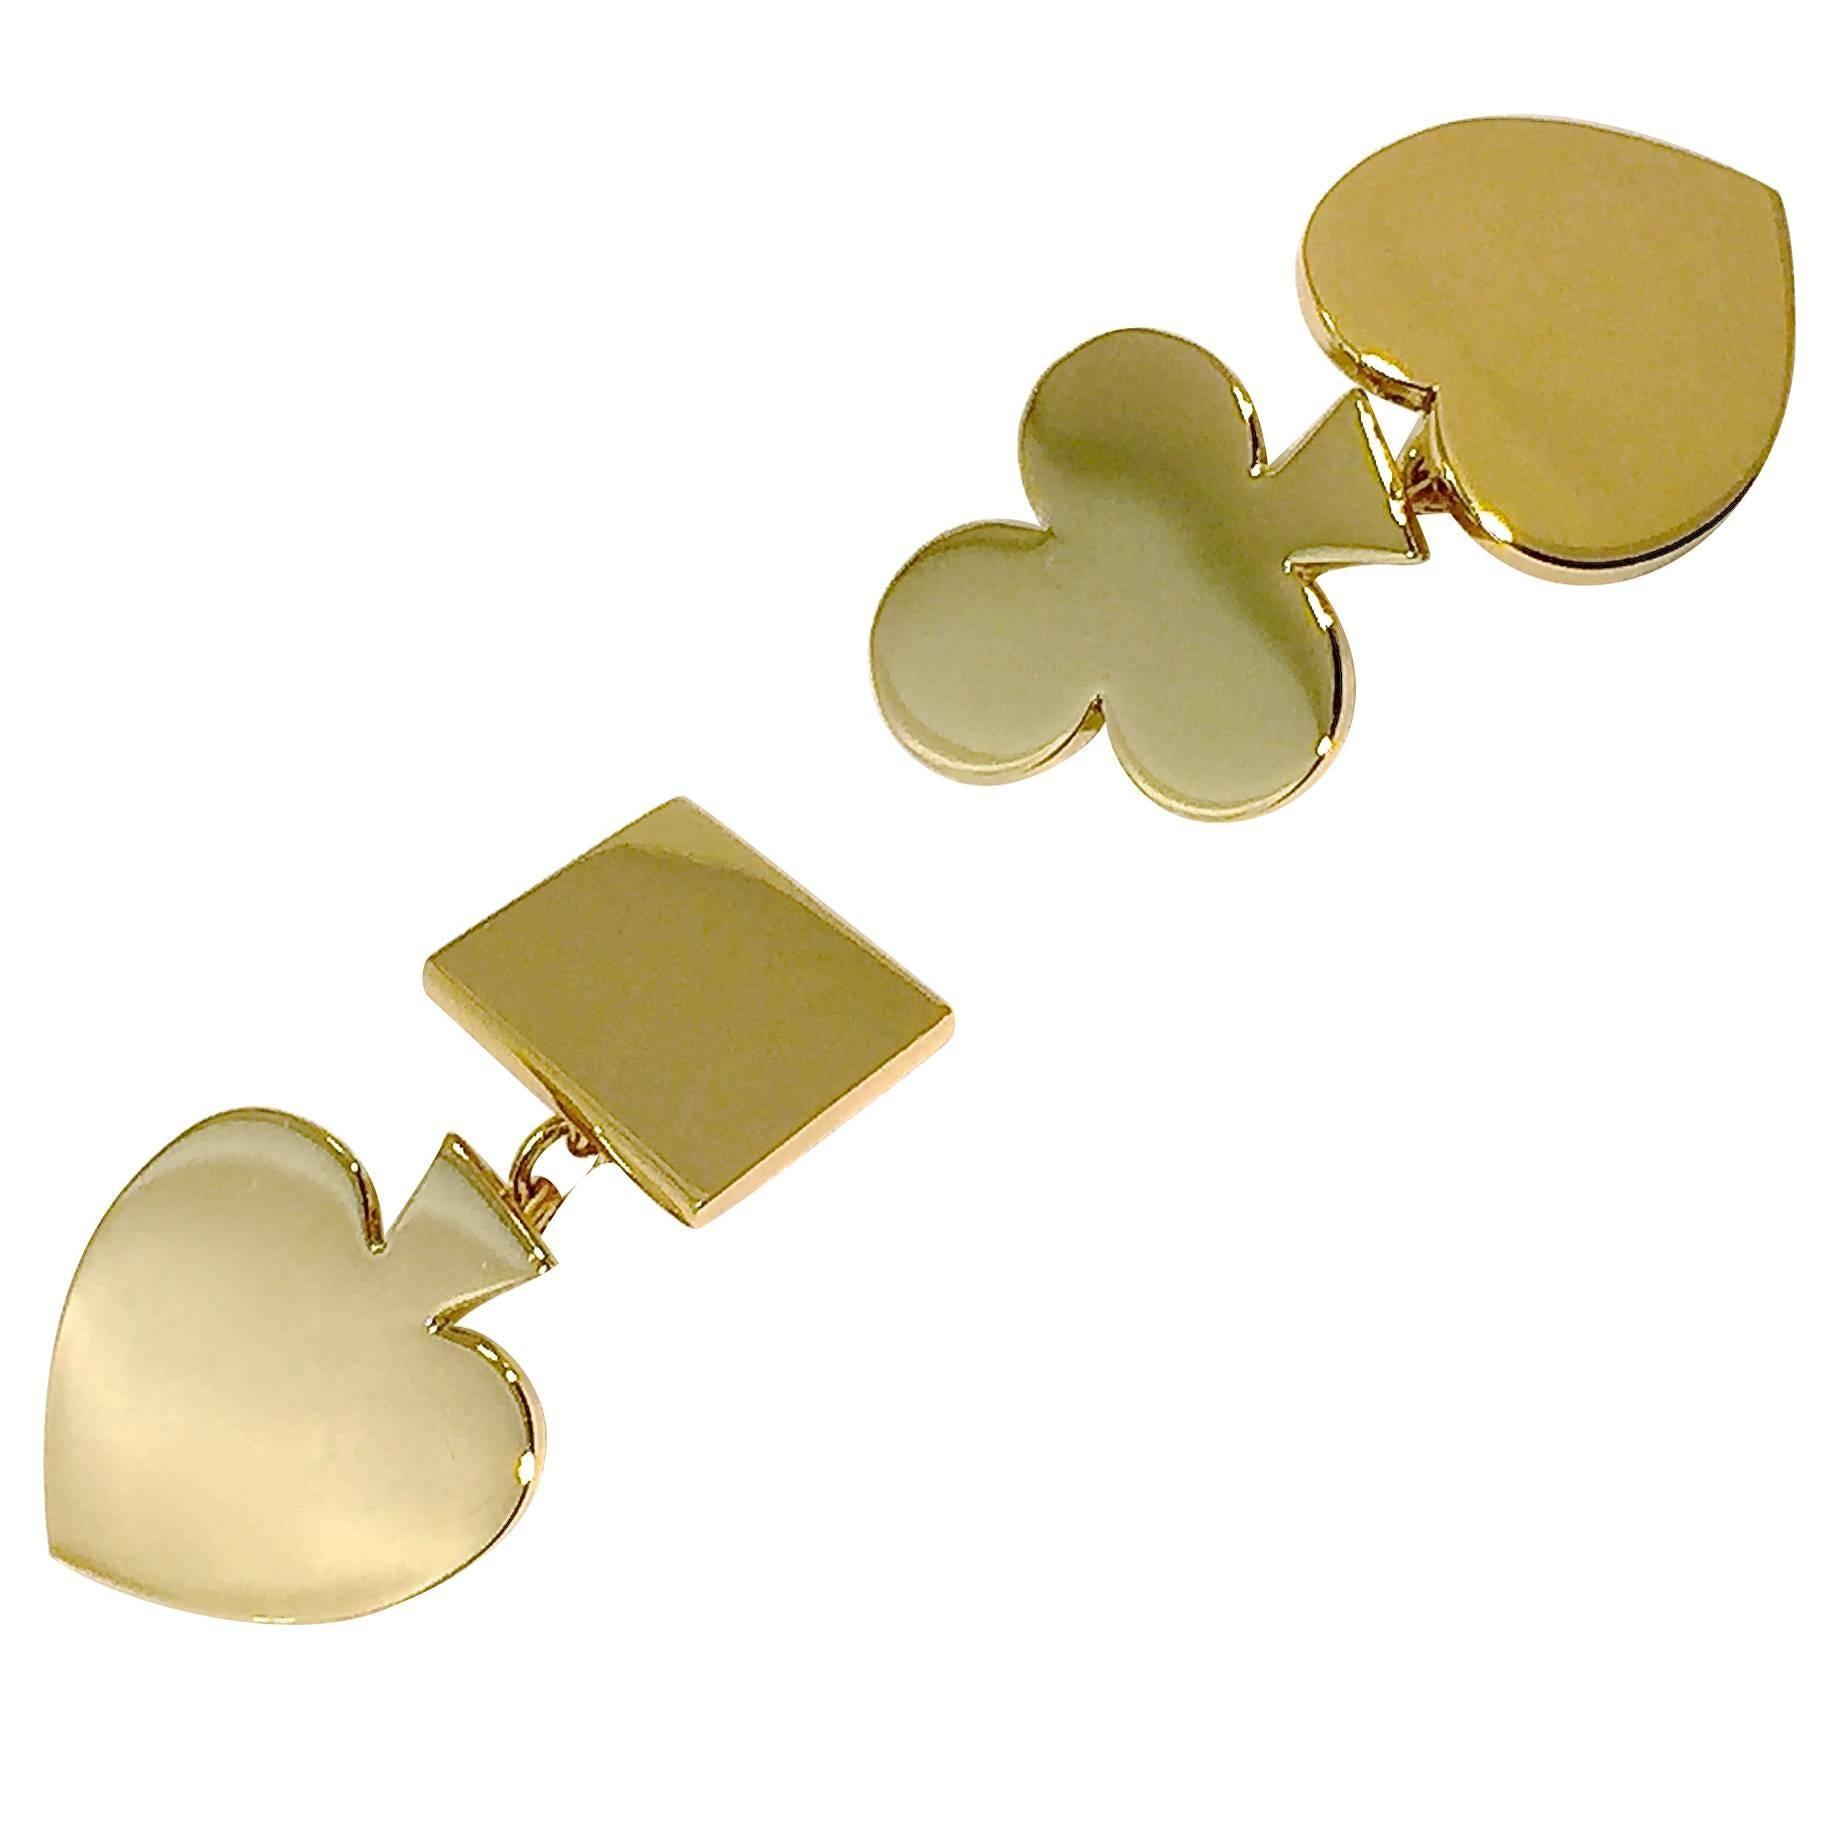 Jona 18 Karat Yellow Gold Card Suits Cufflinks